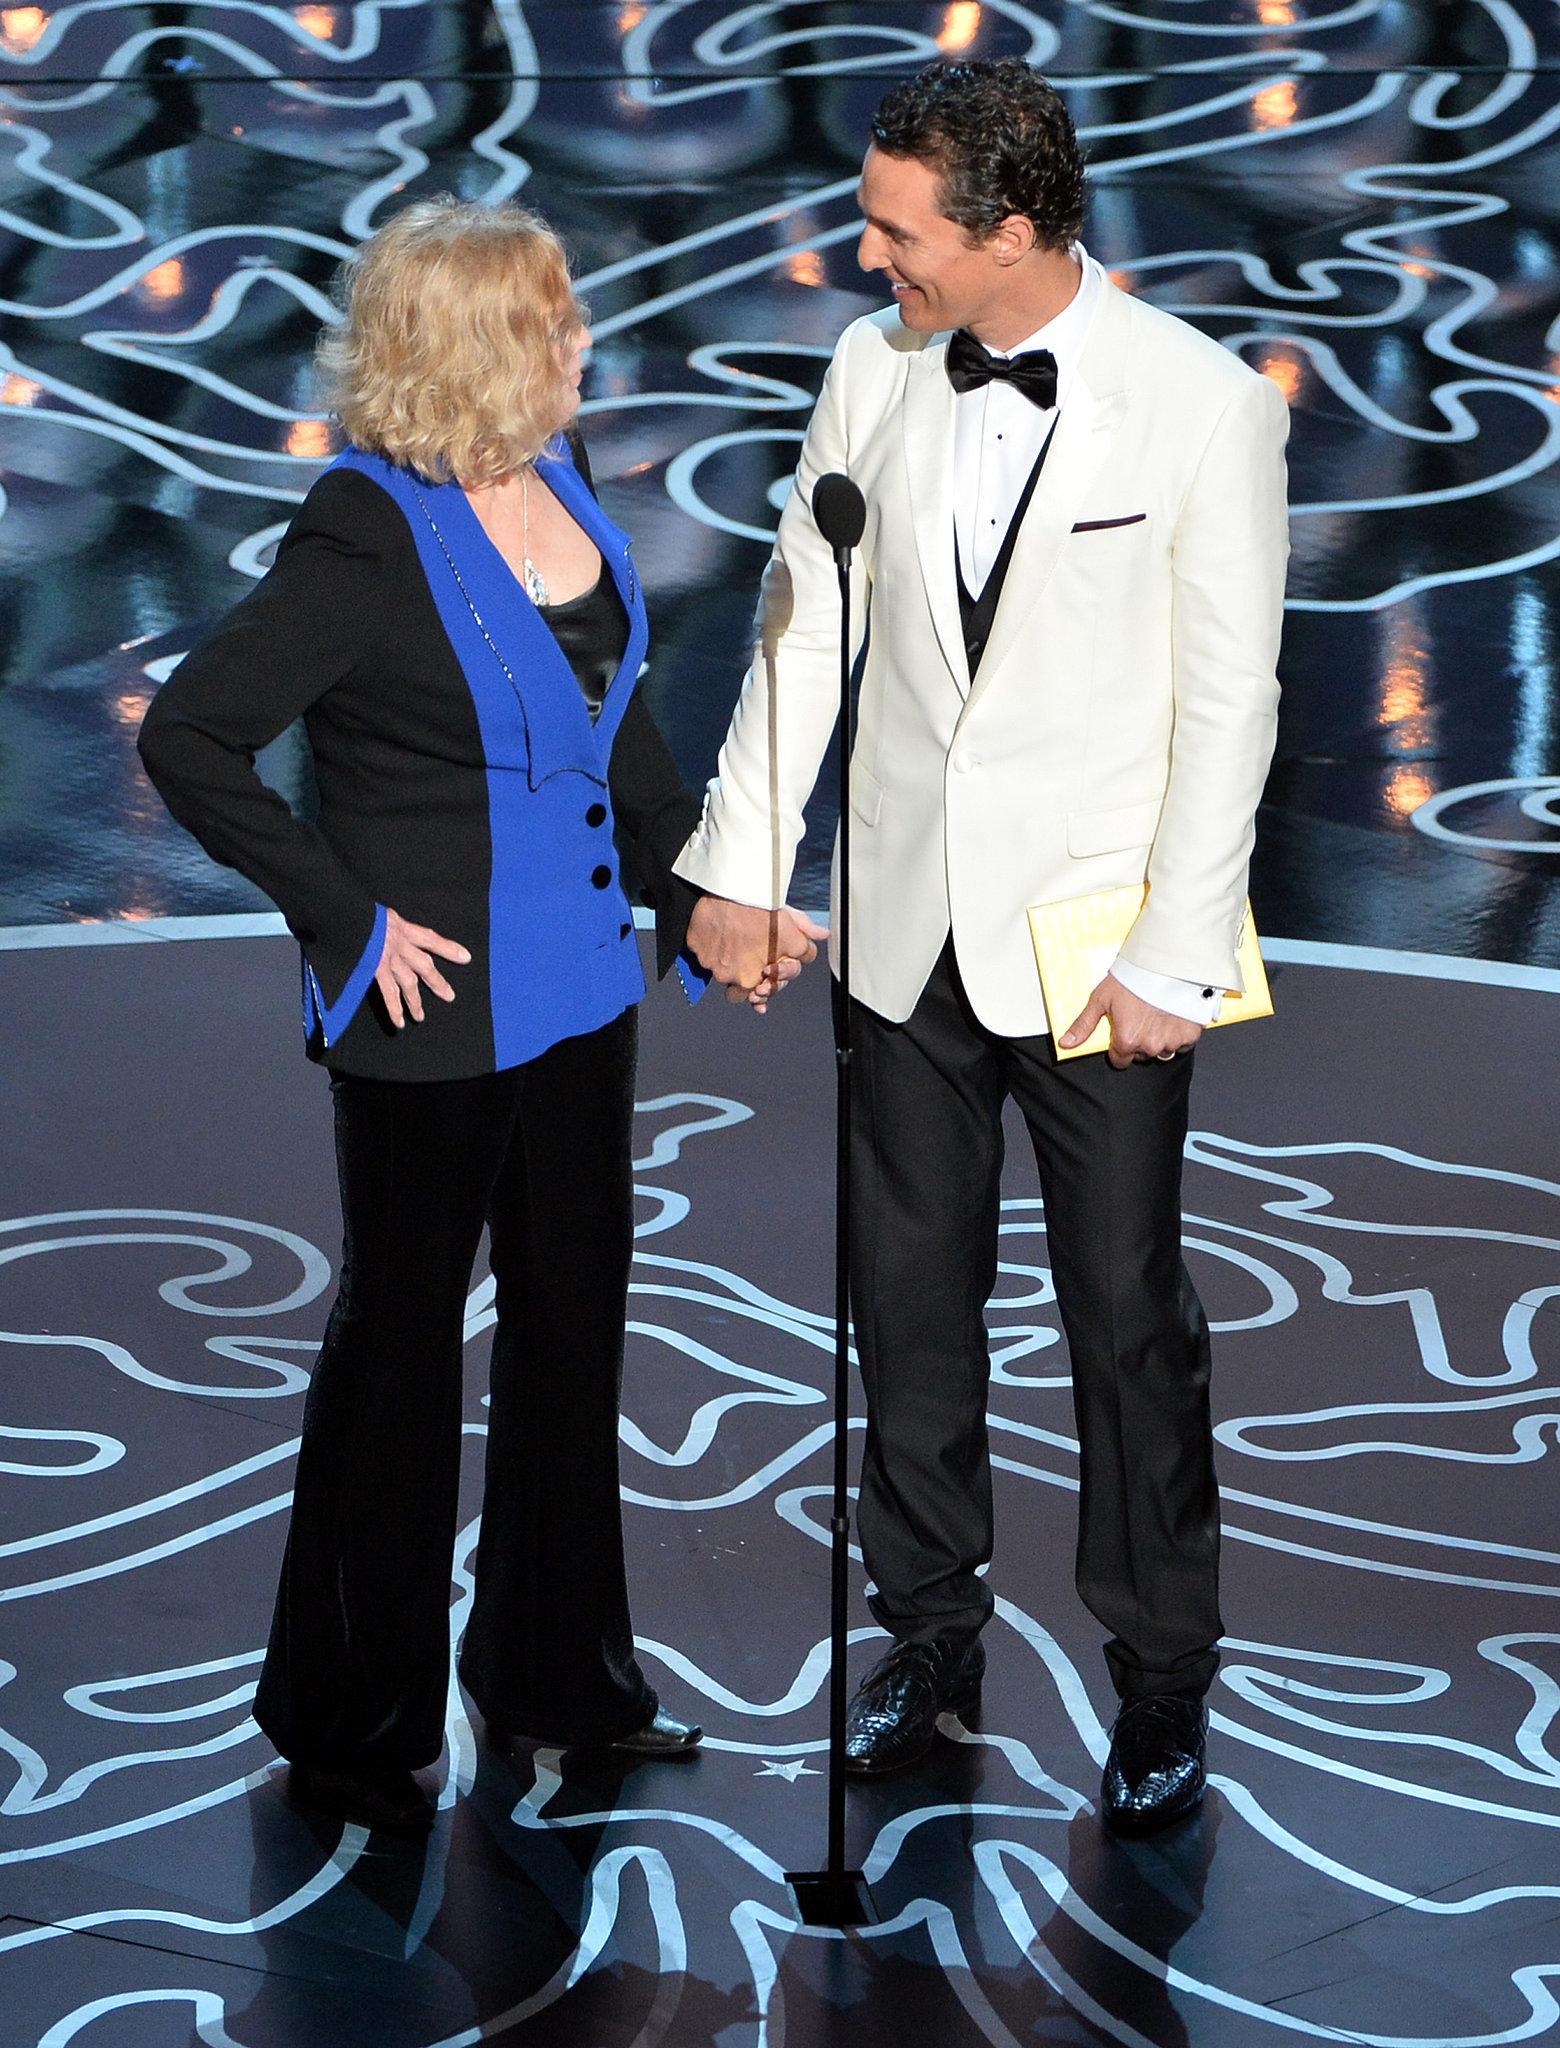 Matthew McConaughey held hands with Kim Novak as they presented an award.